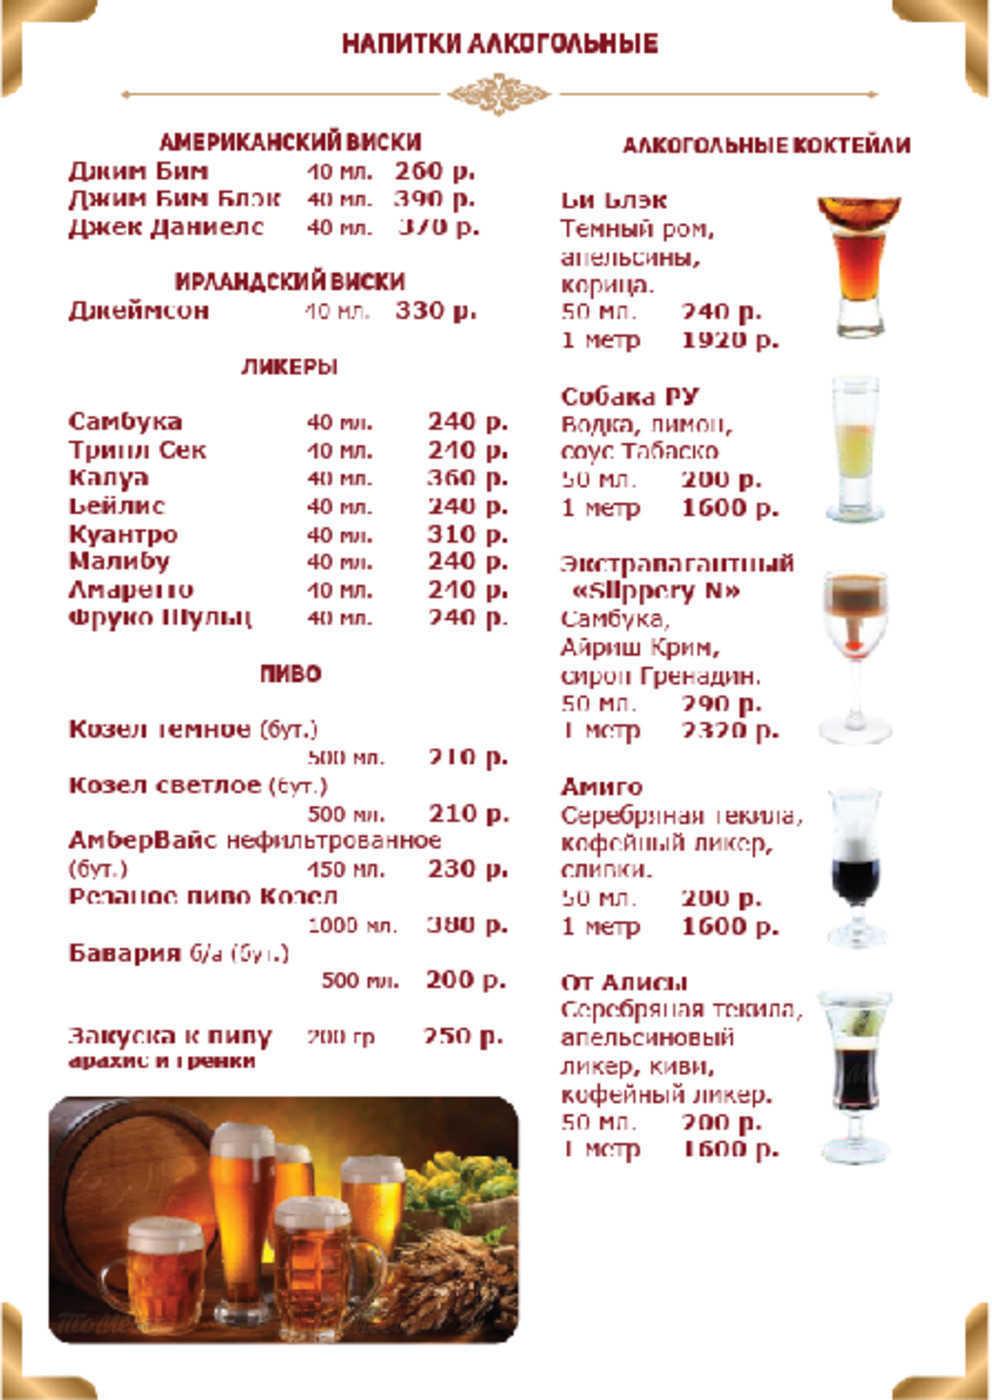 Меню кафе Рубаи на набережной реки Фонтанки фото 31